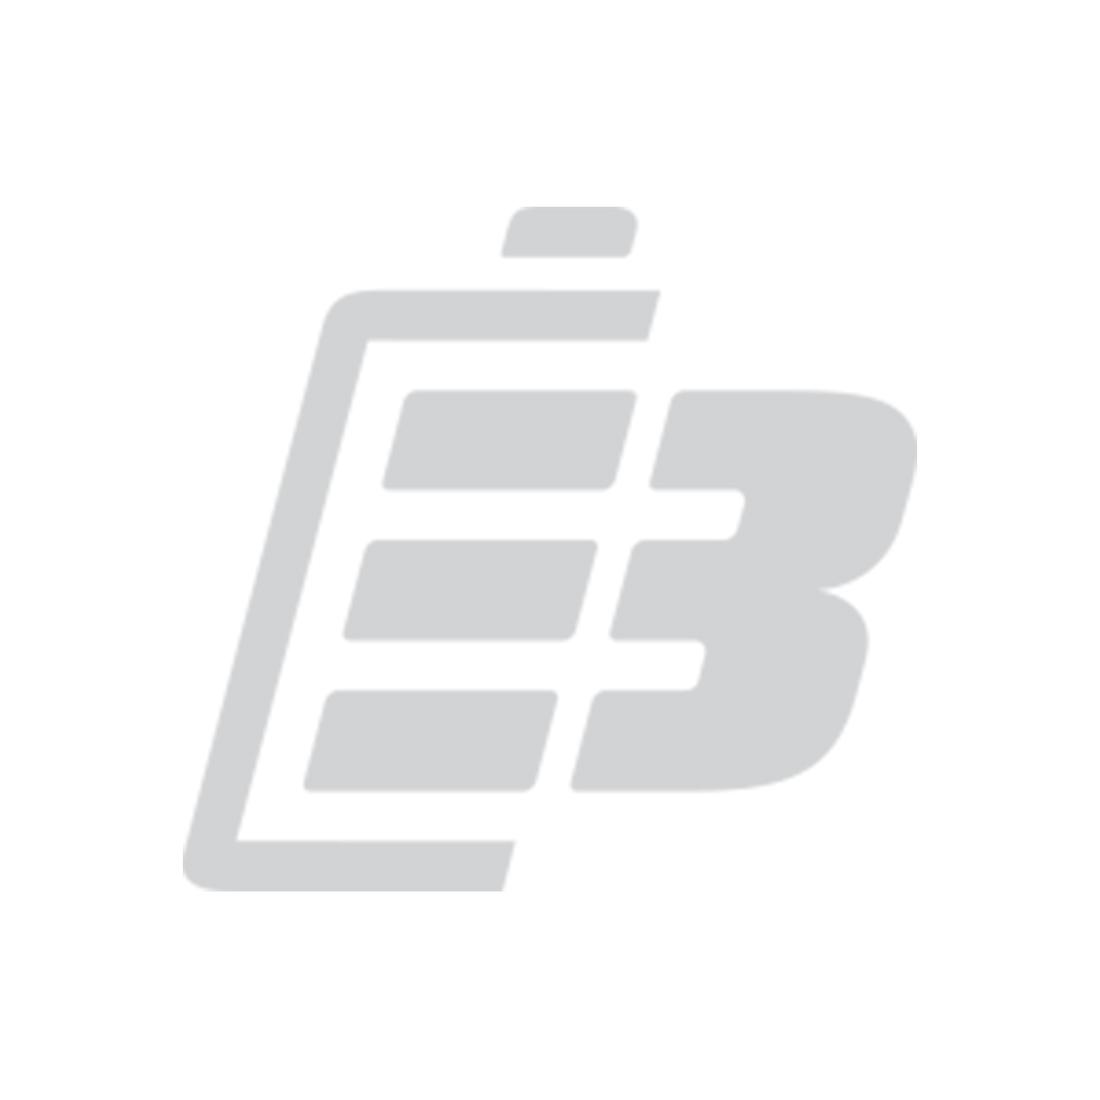 Power tool battery Bosch 36V 4.0Ah LiIon_1